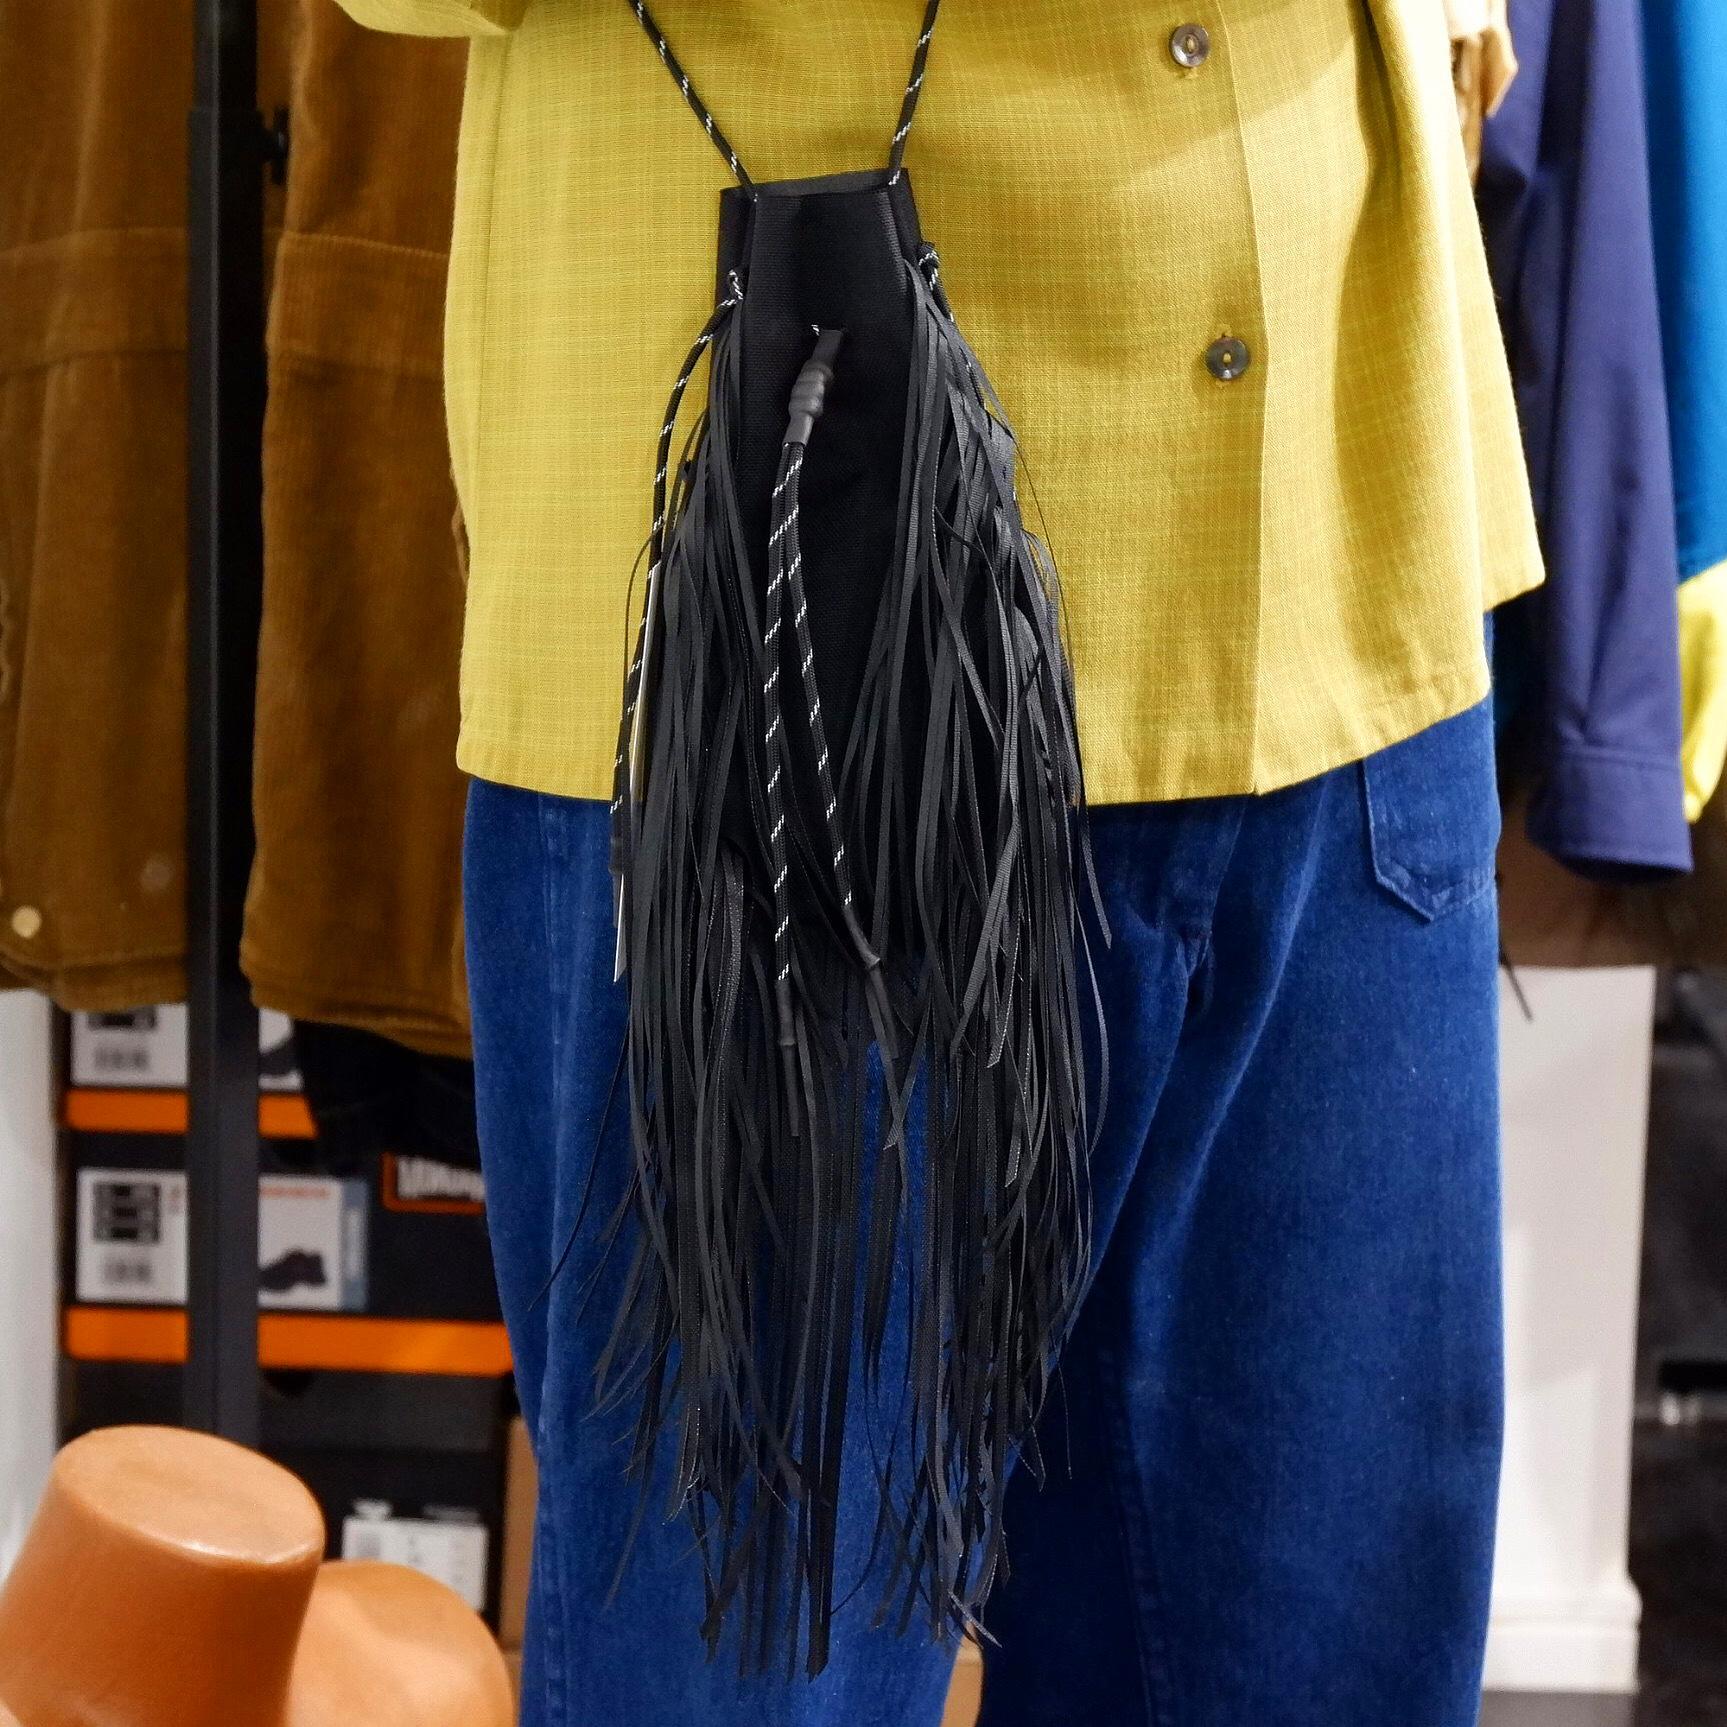 【TAITAI】Fringe Drawstring Bag S Cordura